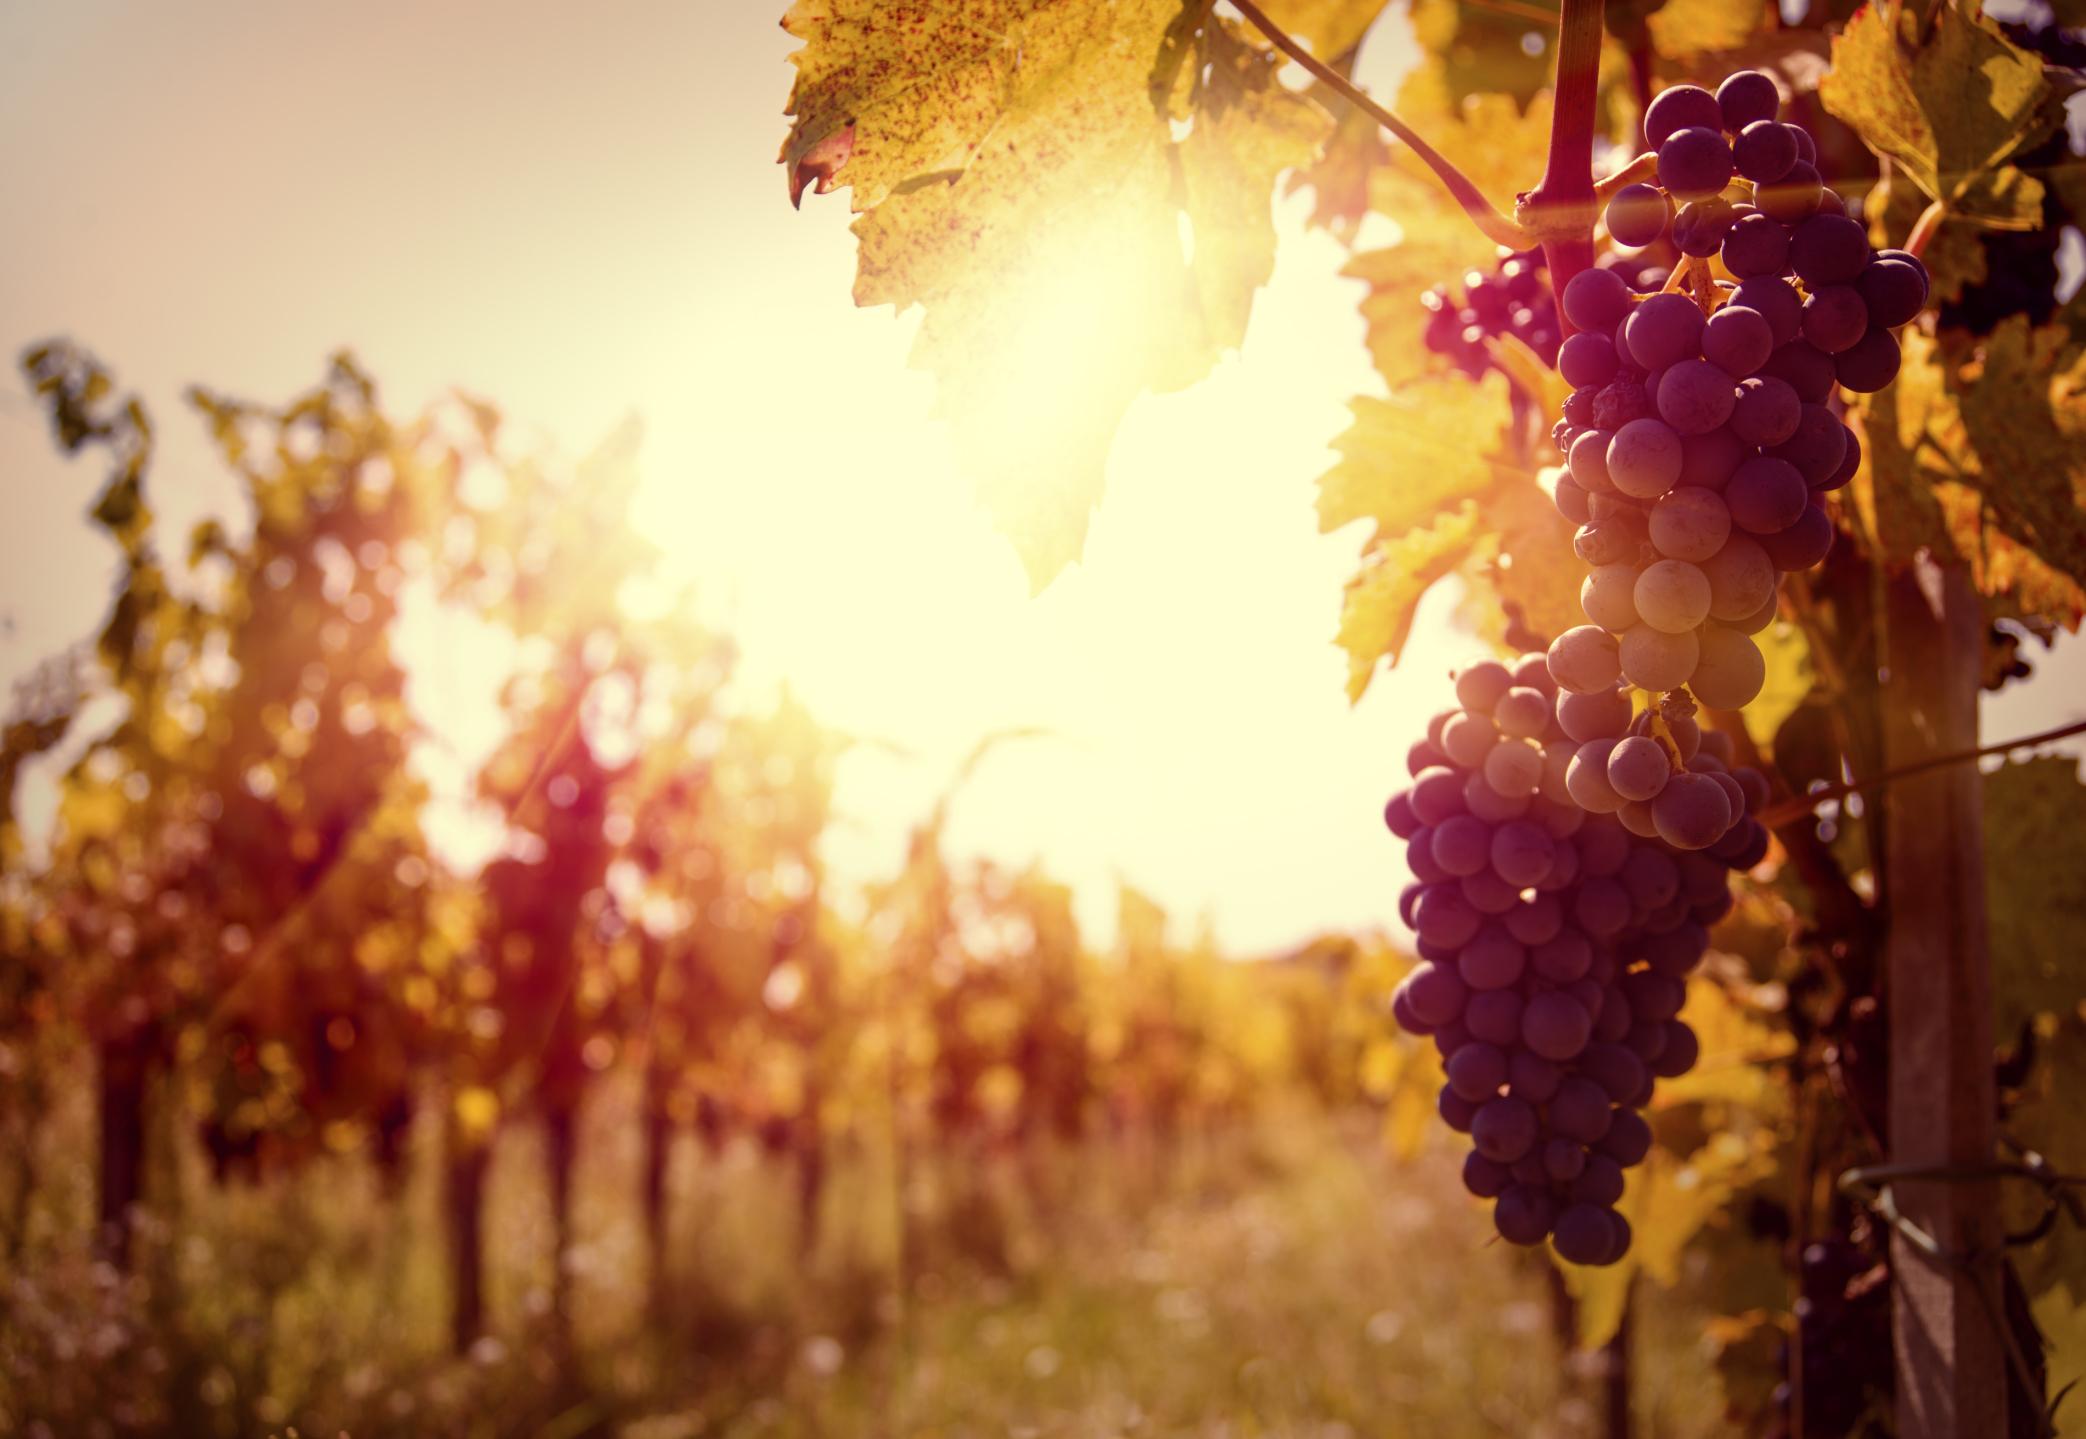 vineyard, vine and branches, John 15